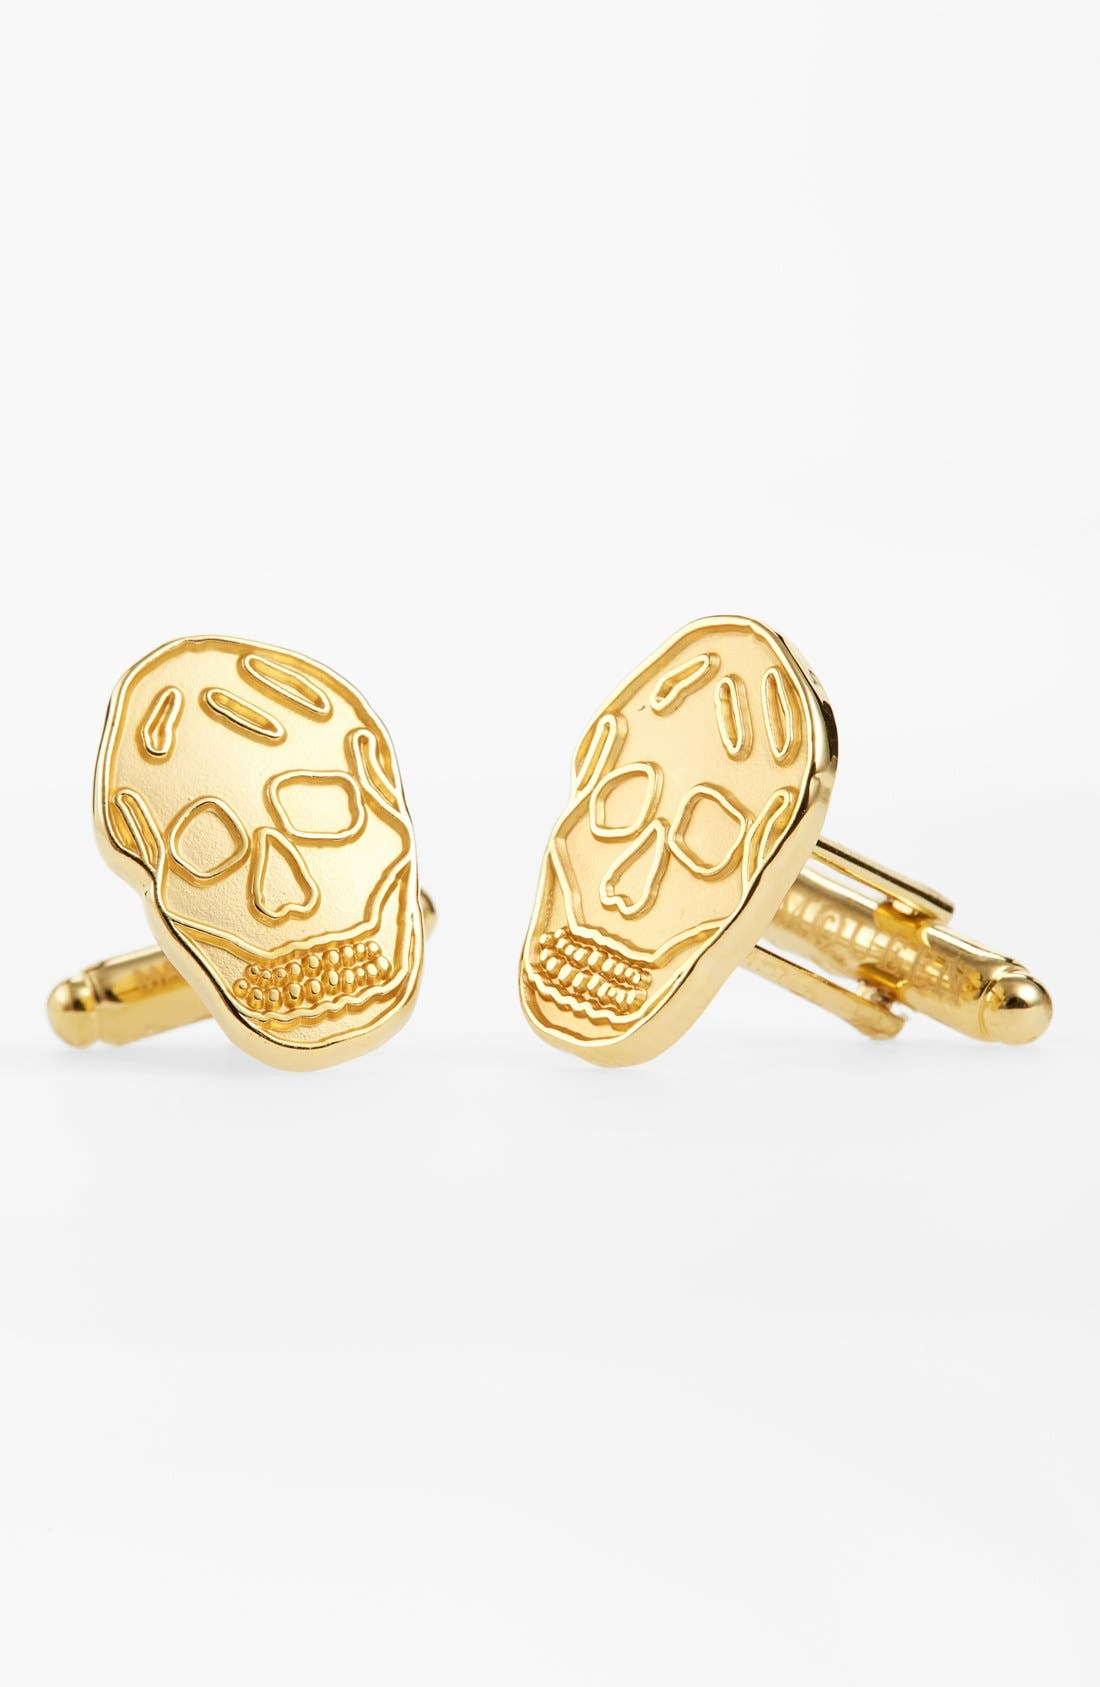 Main Image - Alexander McQueen Brass Skull Cuff Links